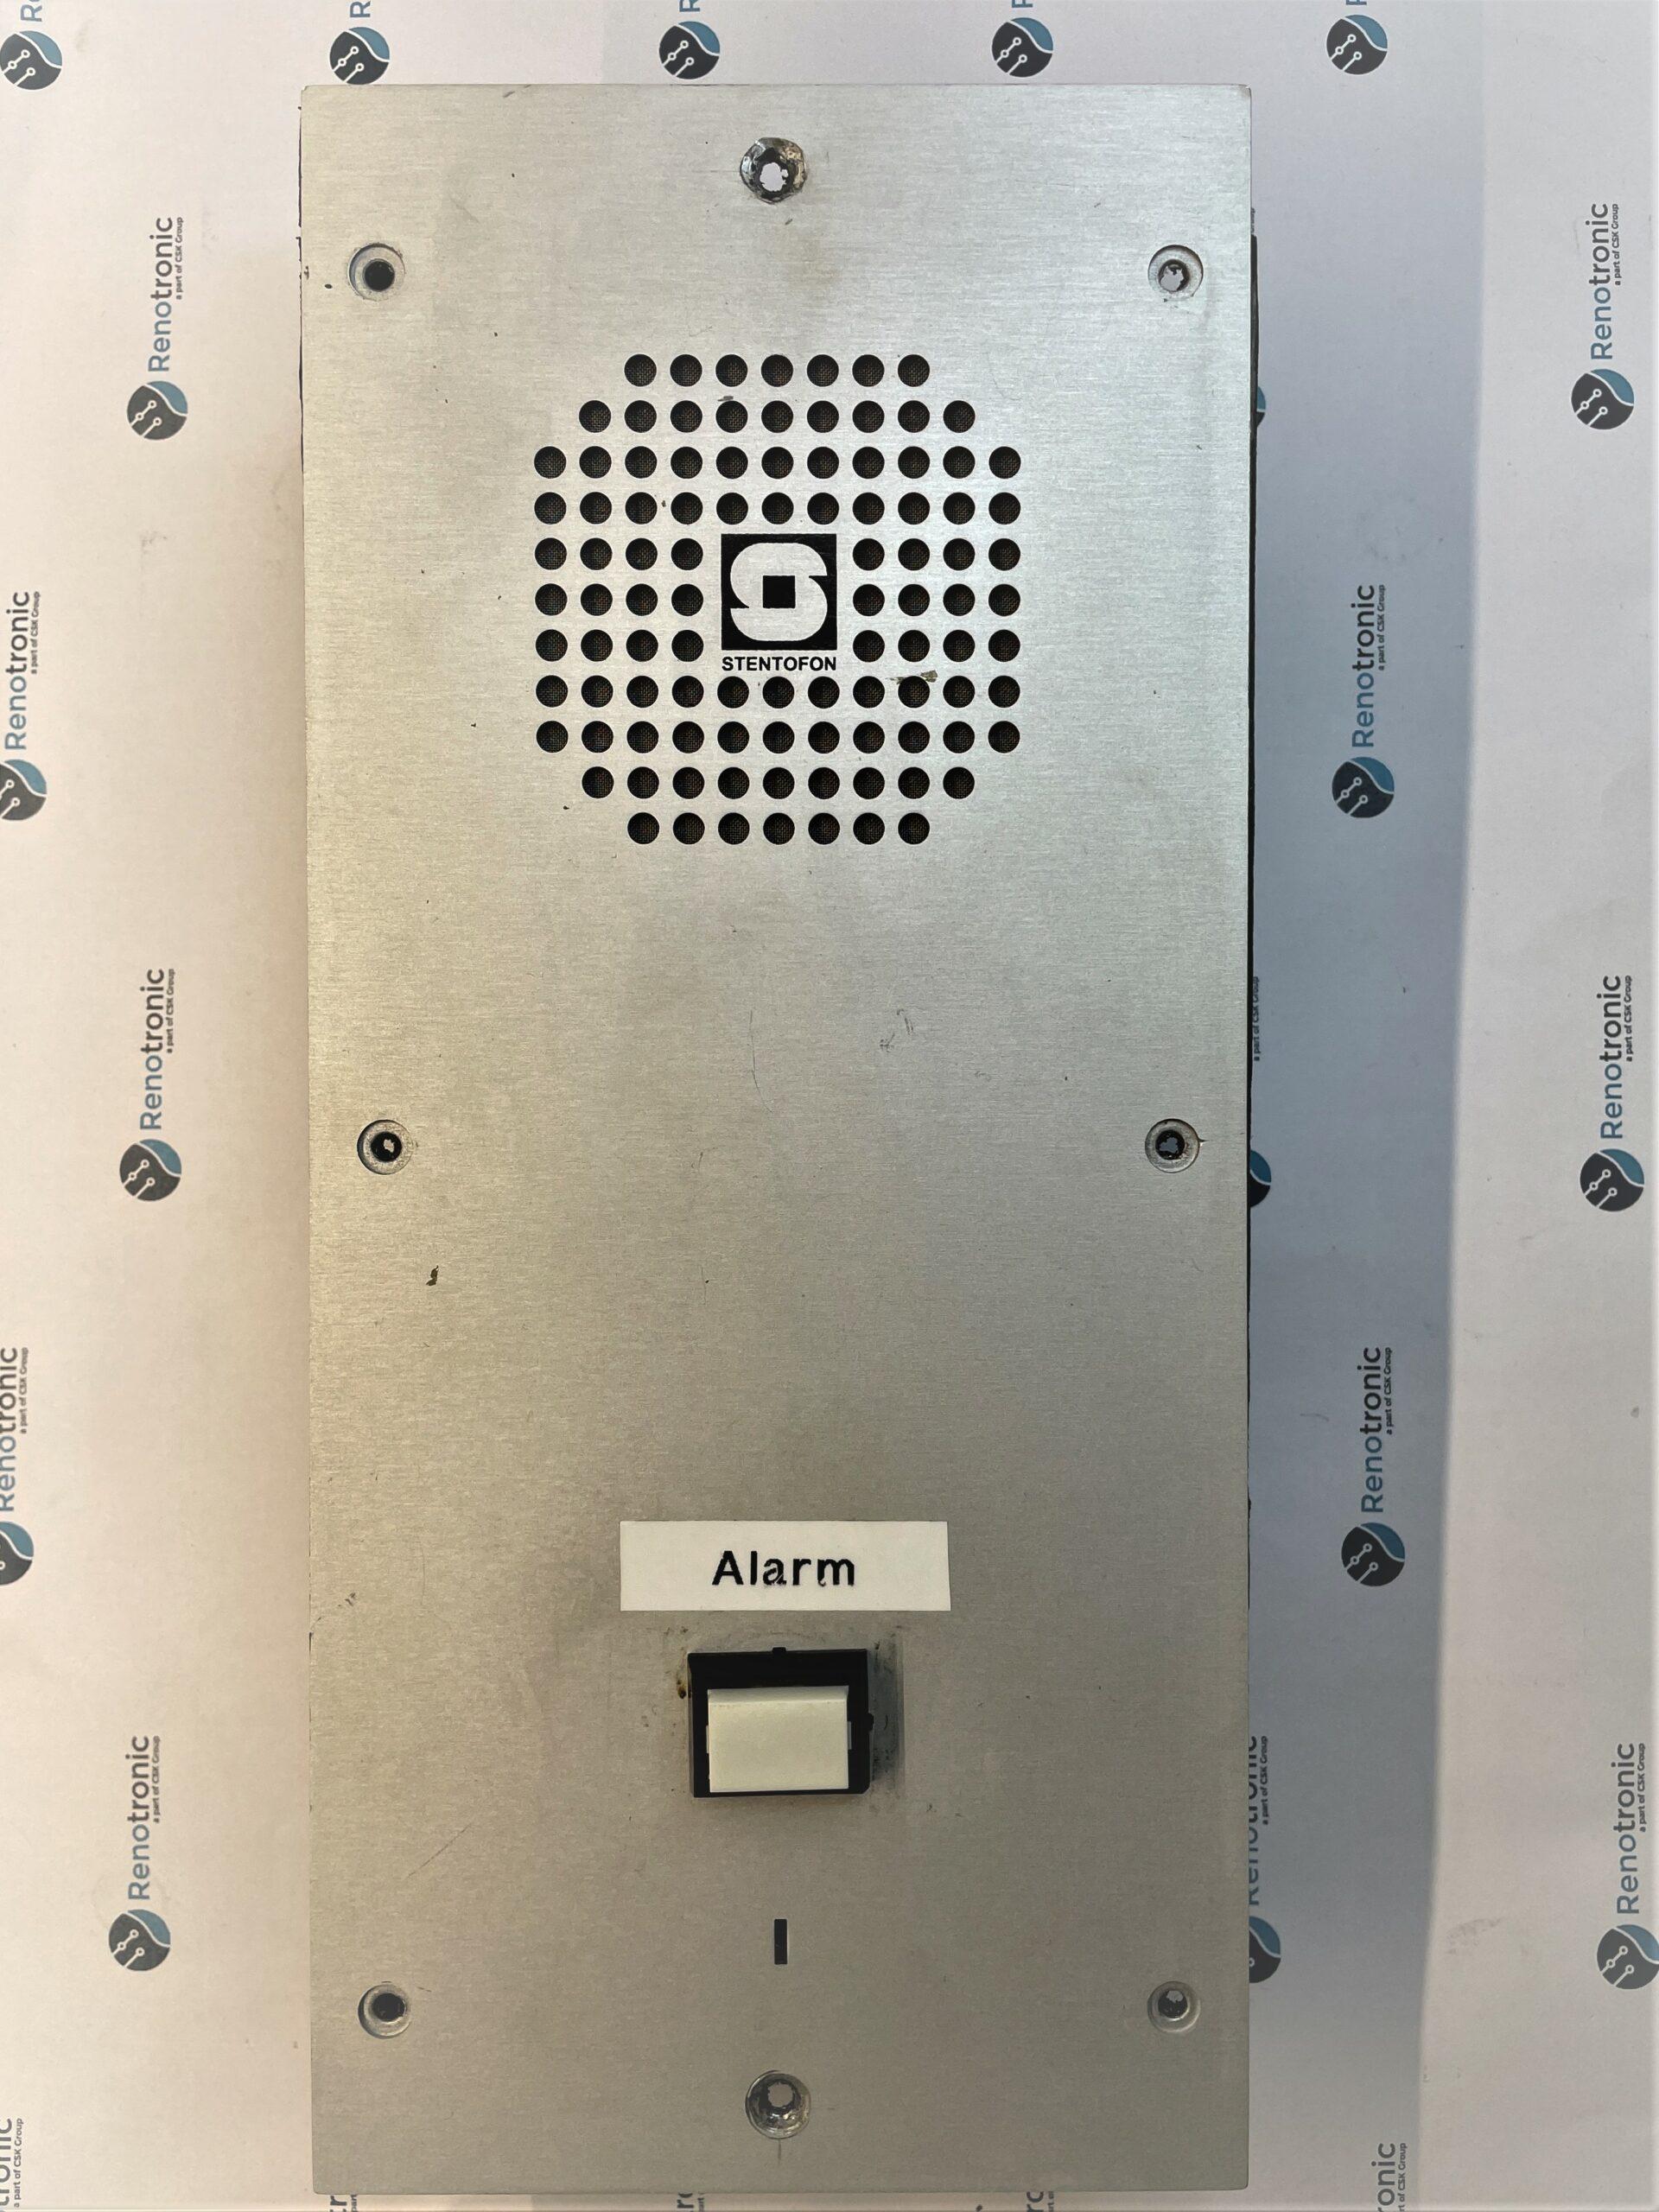 Read more about the article Stentofon / Zenitel alarm panel